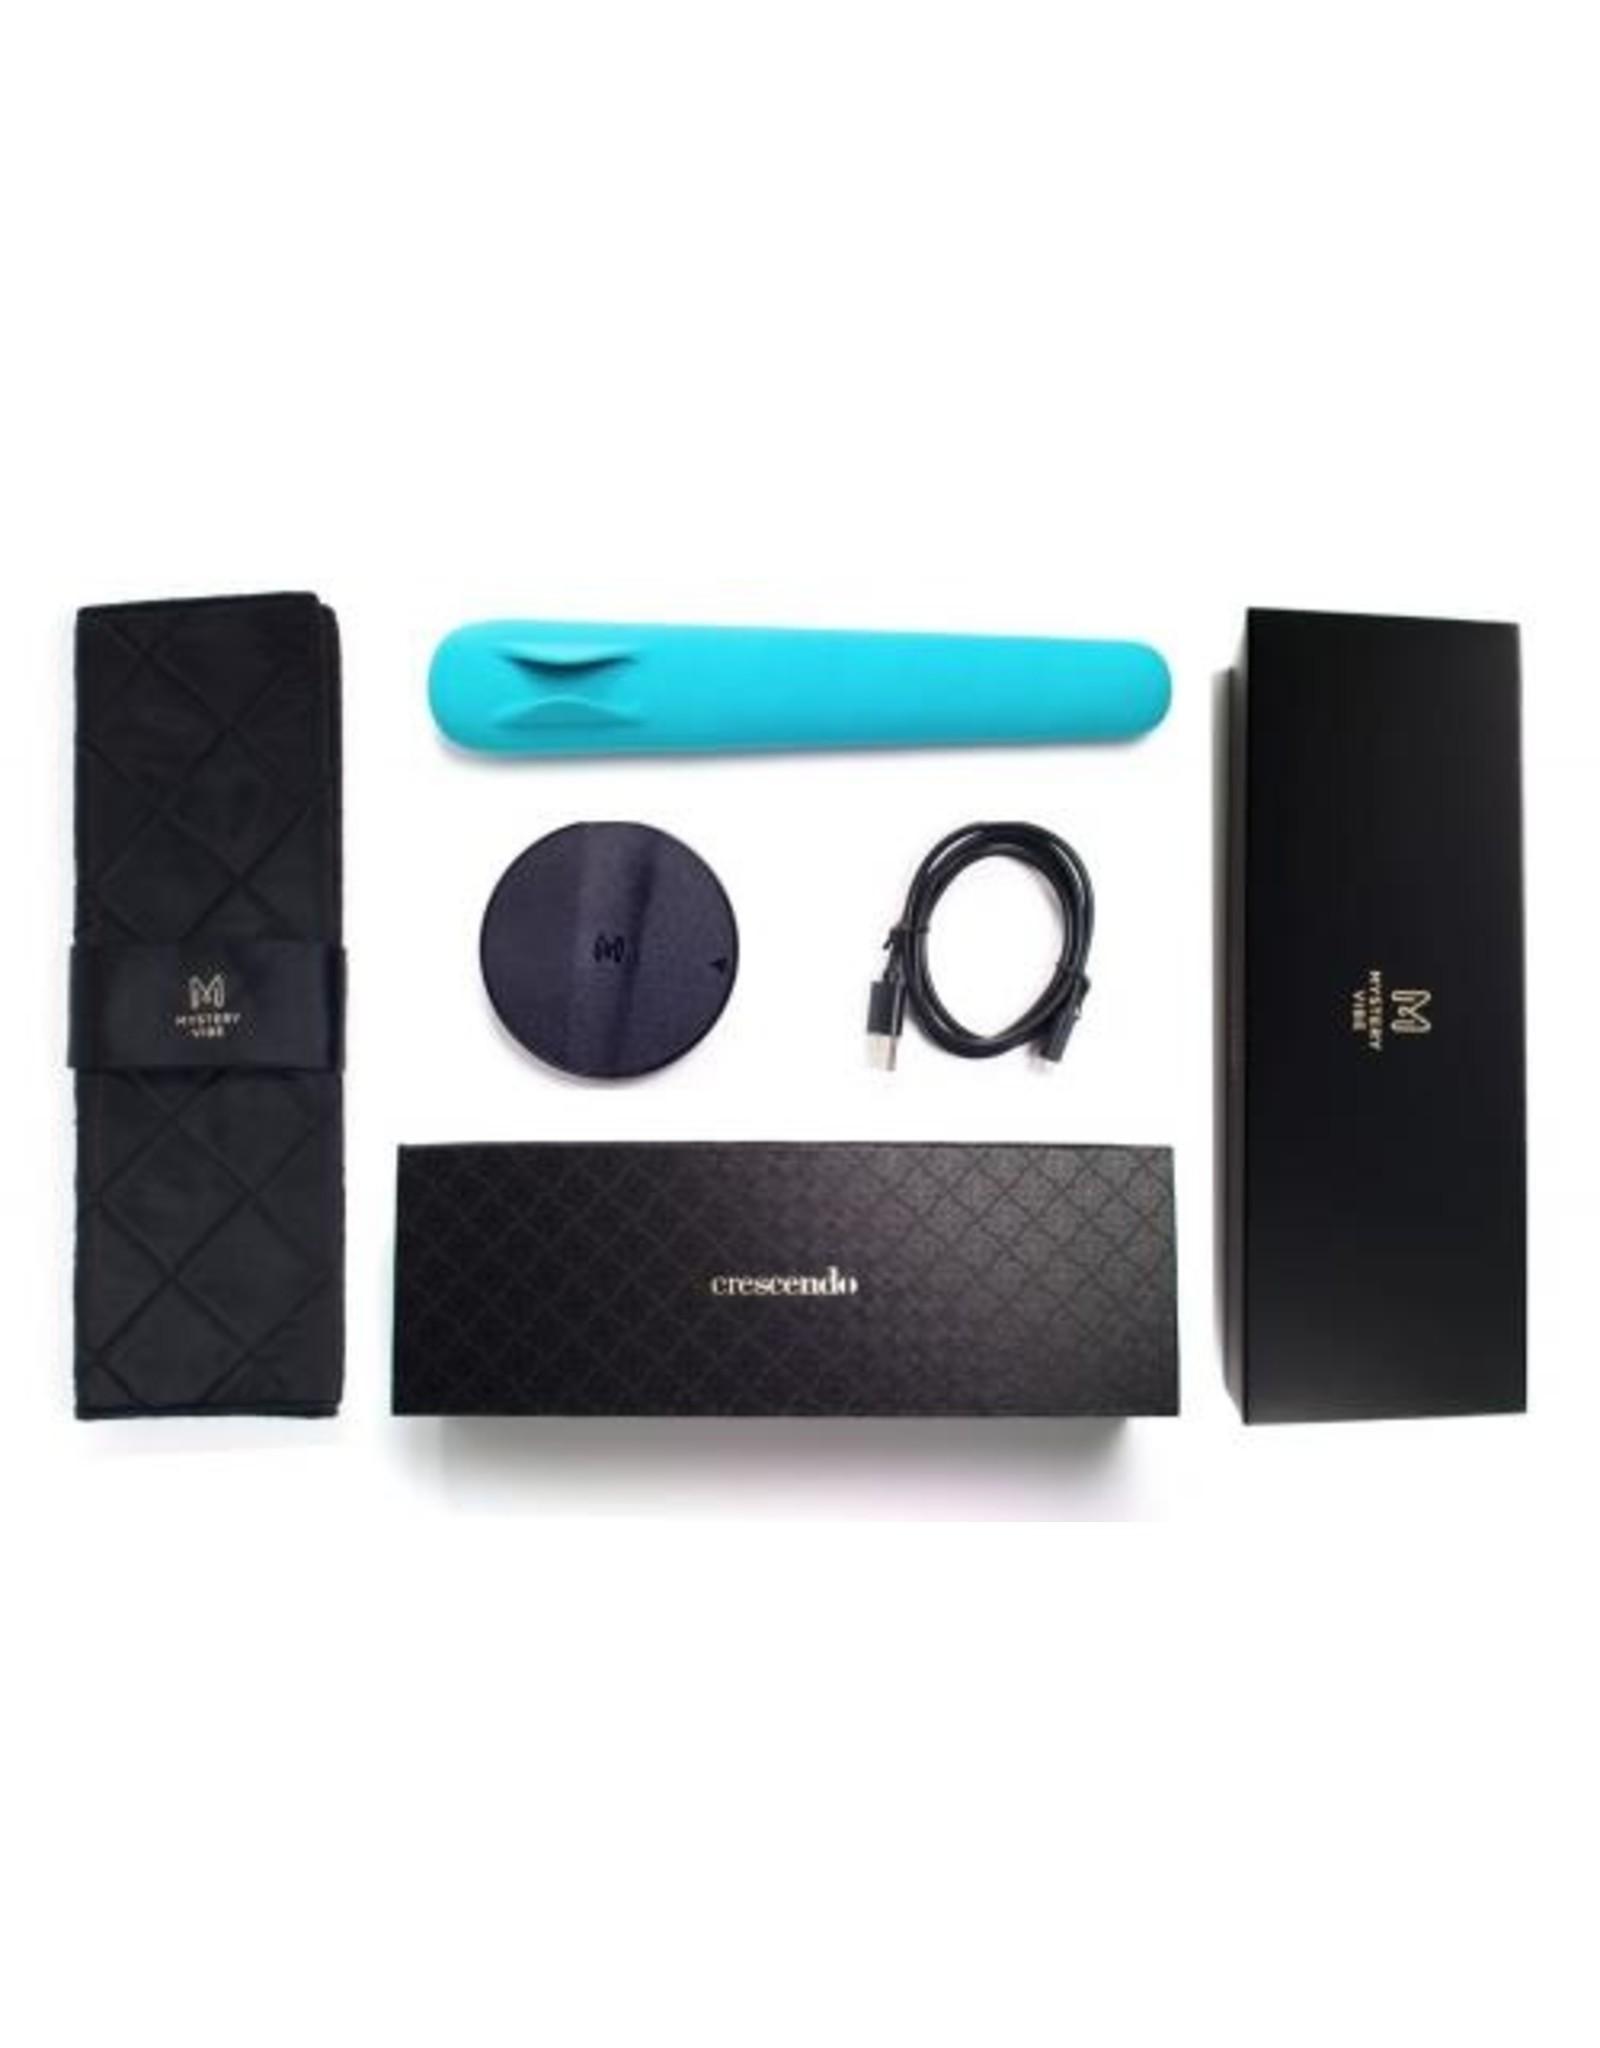 Mysteryvibe Crescendo Buigzame G-Spot Vibrator - Aqua